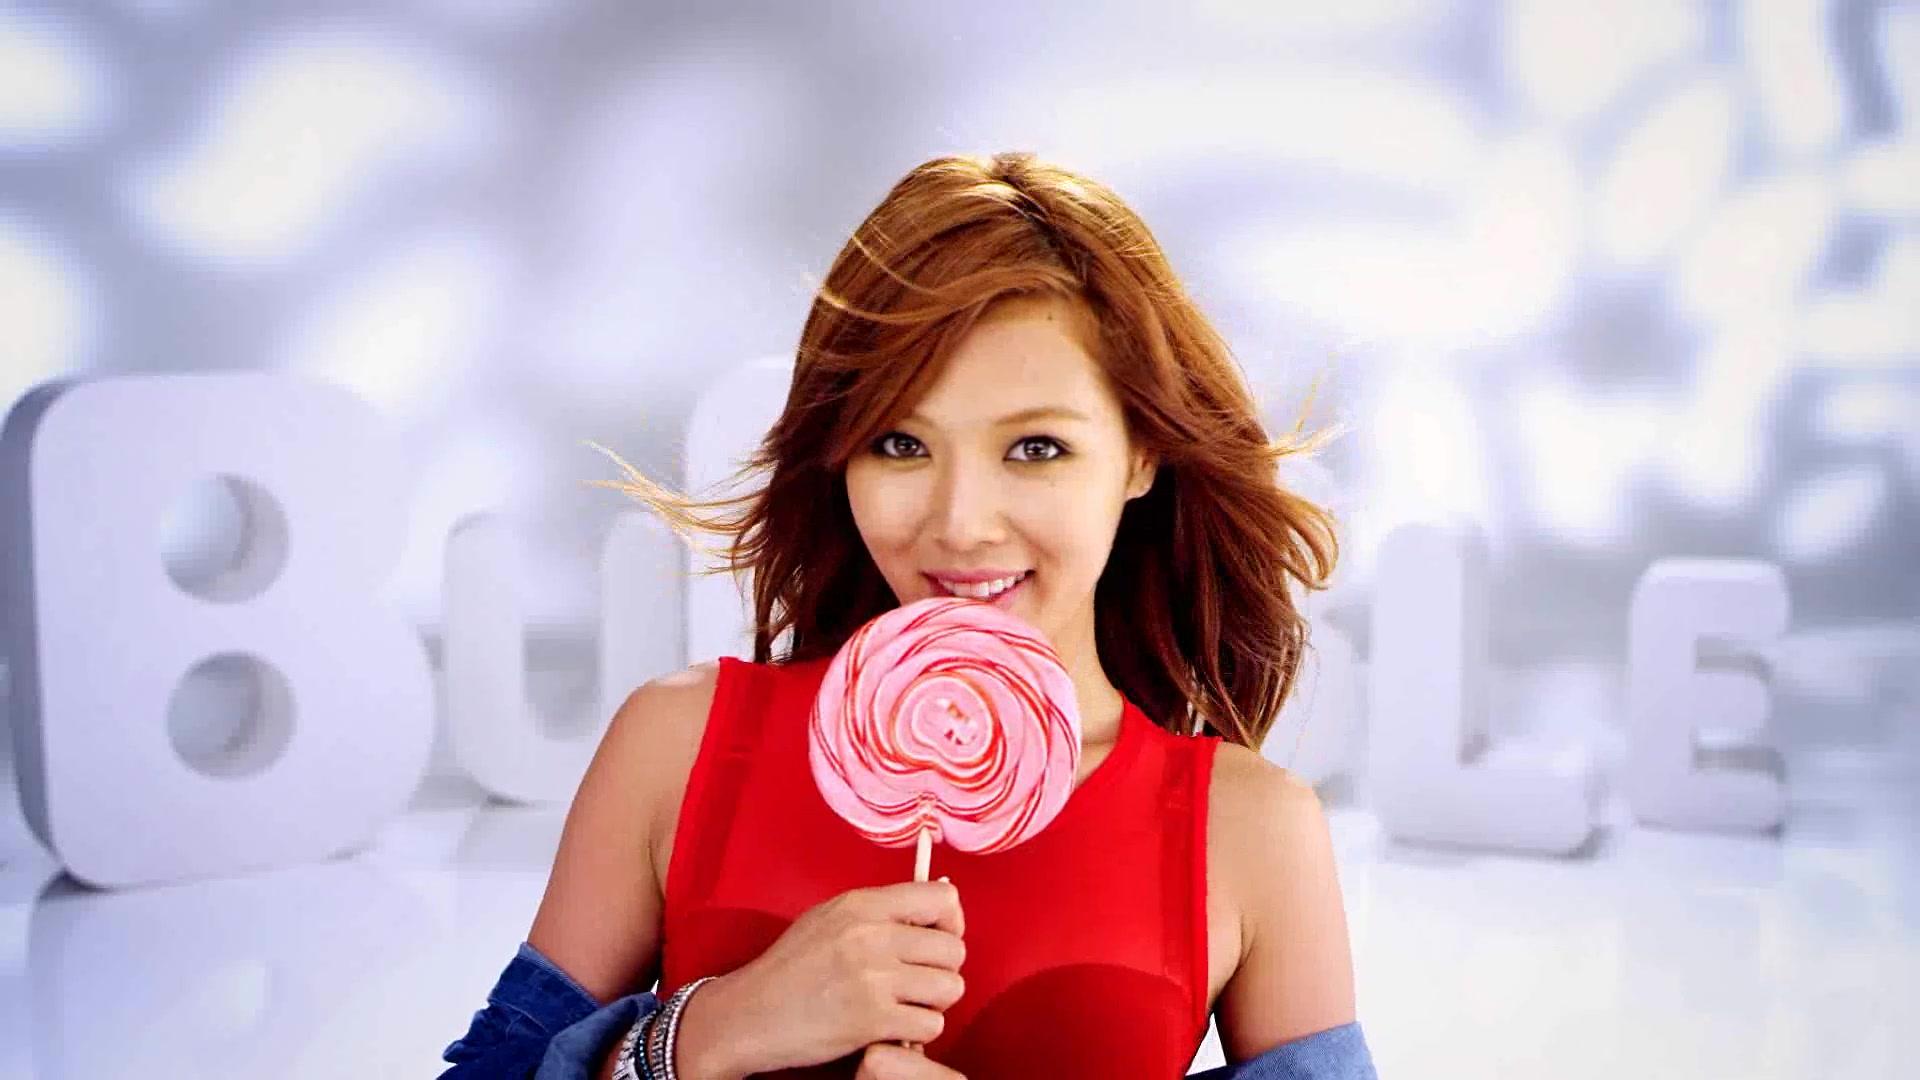 hyuna - photo #26